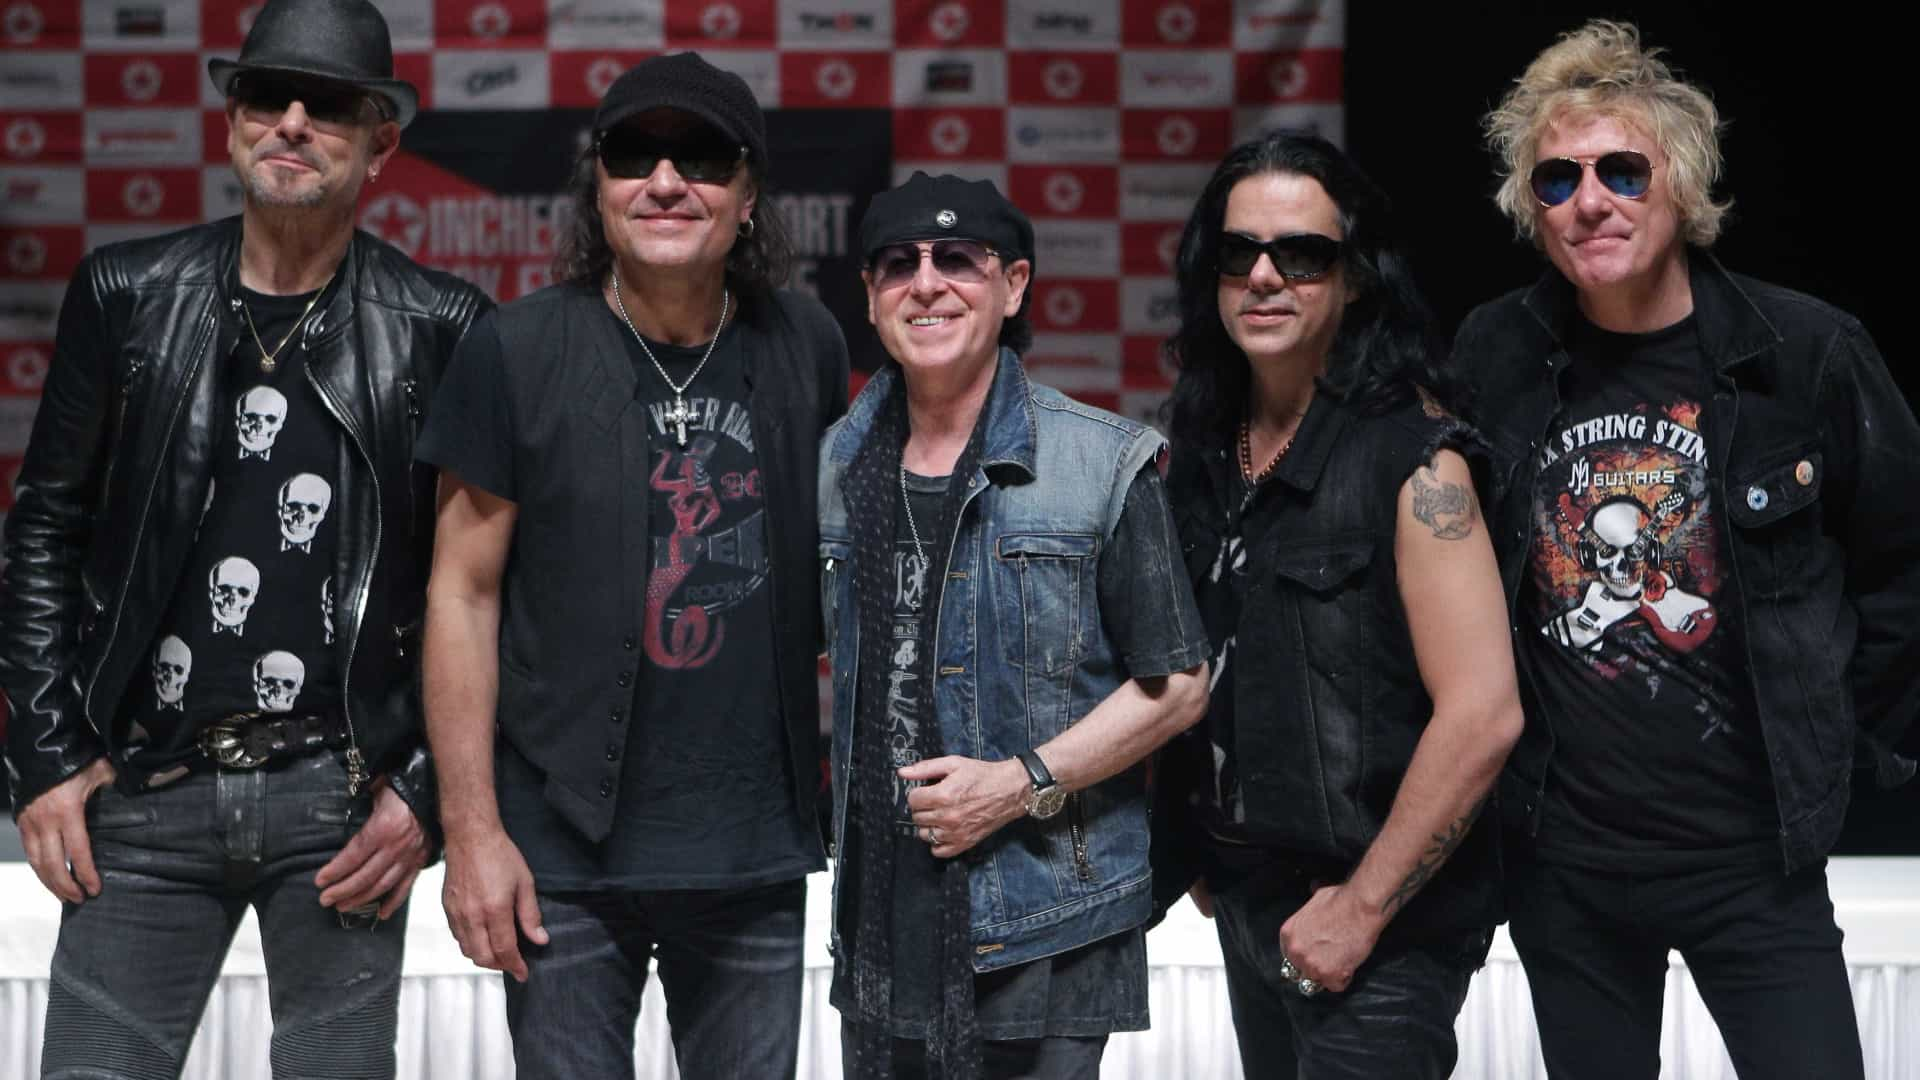 Kiss e Scorpions de rock no estádio municipal de Oeiras